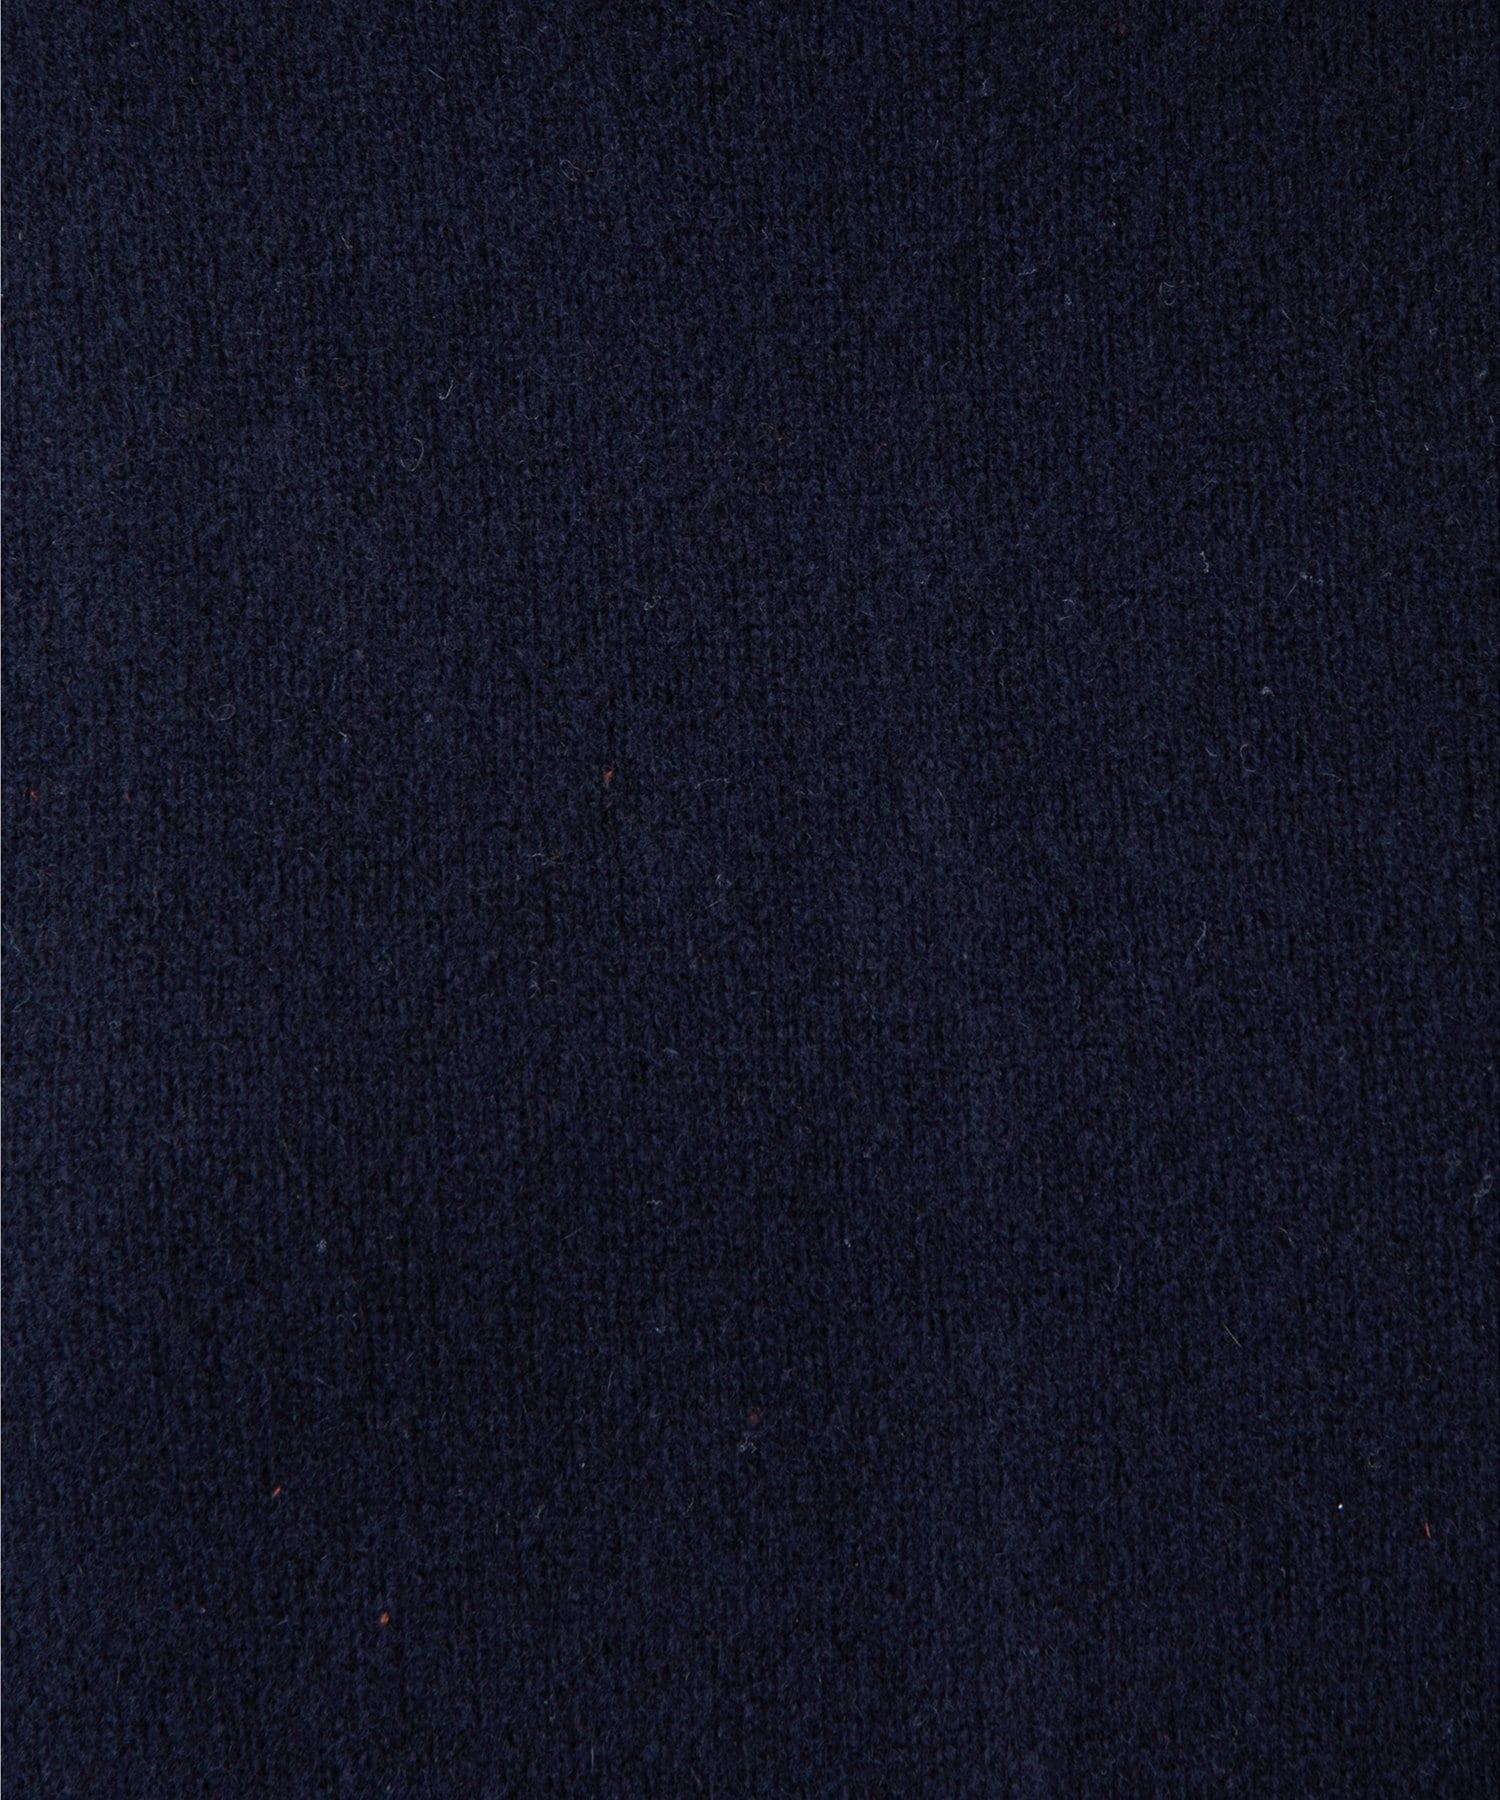 GALLARDAGALANTE(ガリャルダガランテ) 【CEPIE.】ワインディングタートルニット